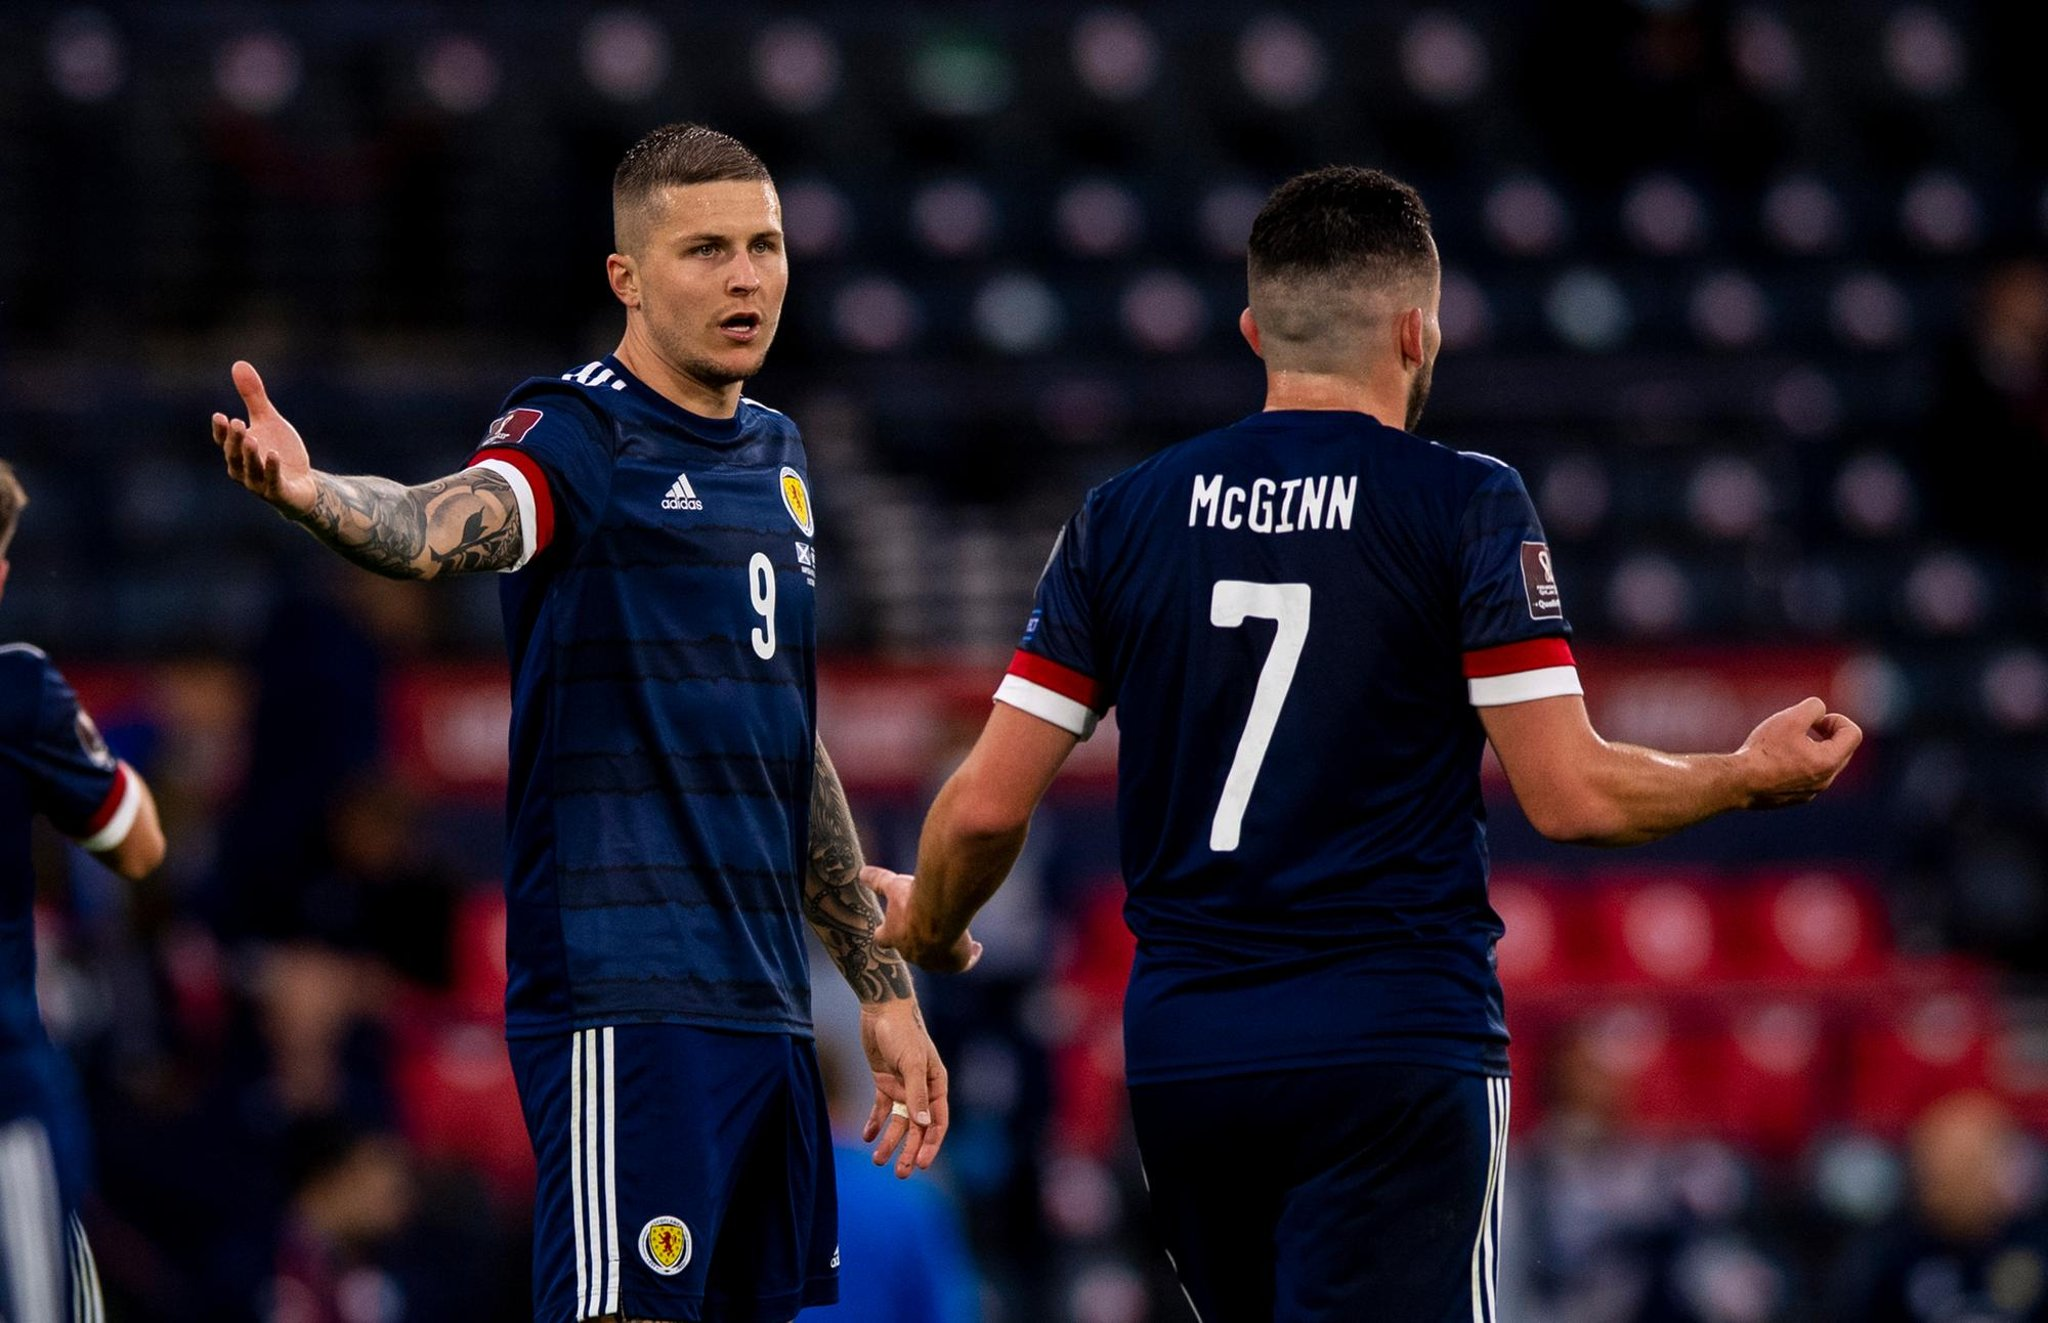 Transfer Celtic dan Rangers 'kekecewaan', bintang Hearts 'cocok dengan tagihan' untuk kepindahan Ibrox, target striker Parkhead, pembicaraan bonus Dundee – Liga Utama Skotlandia Rumor Mill